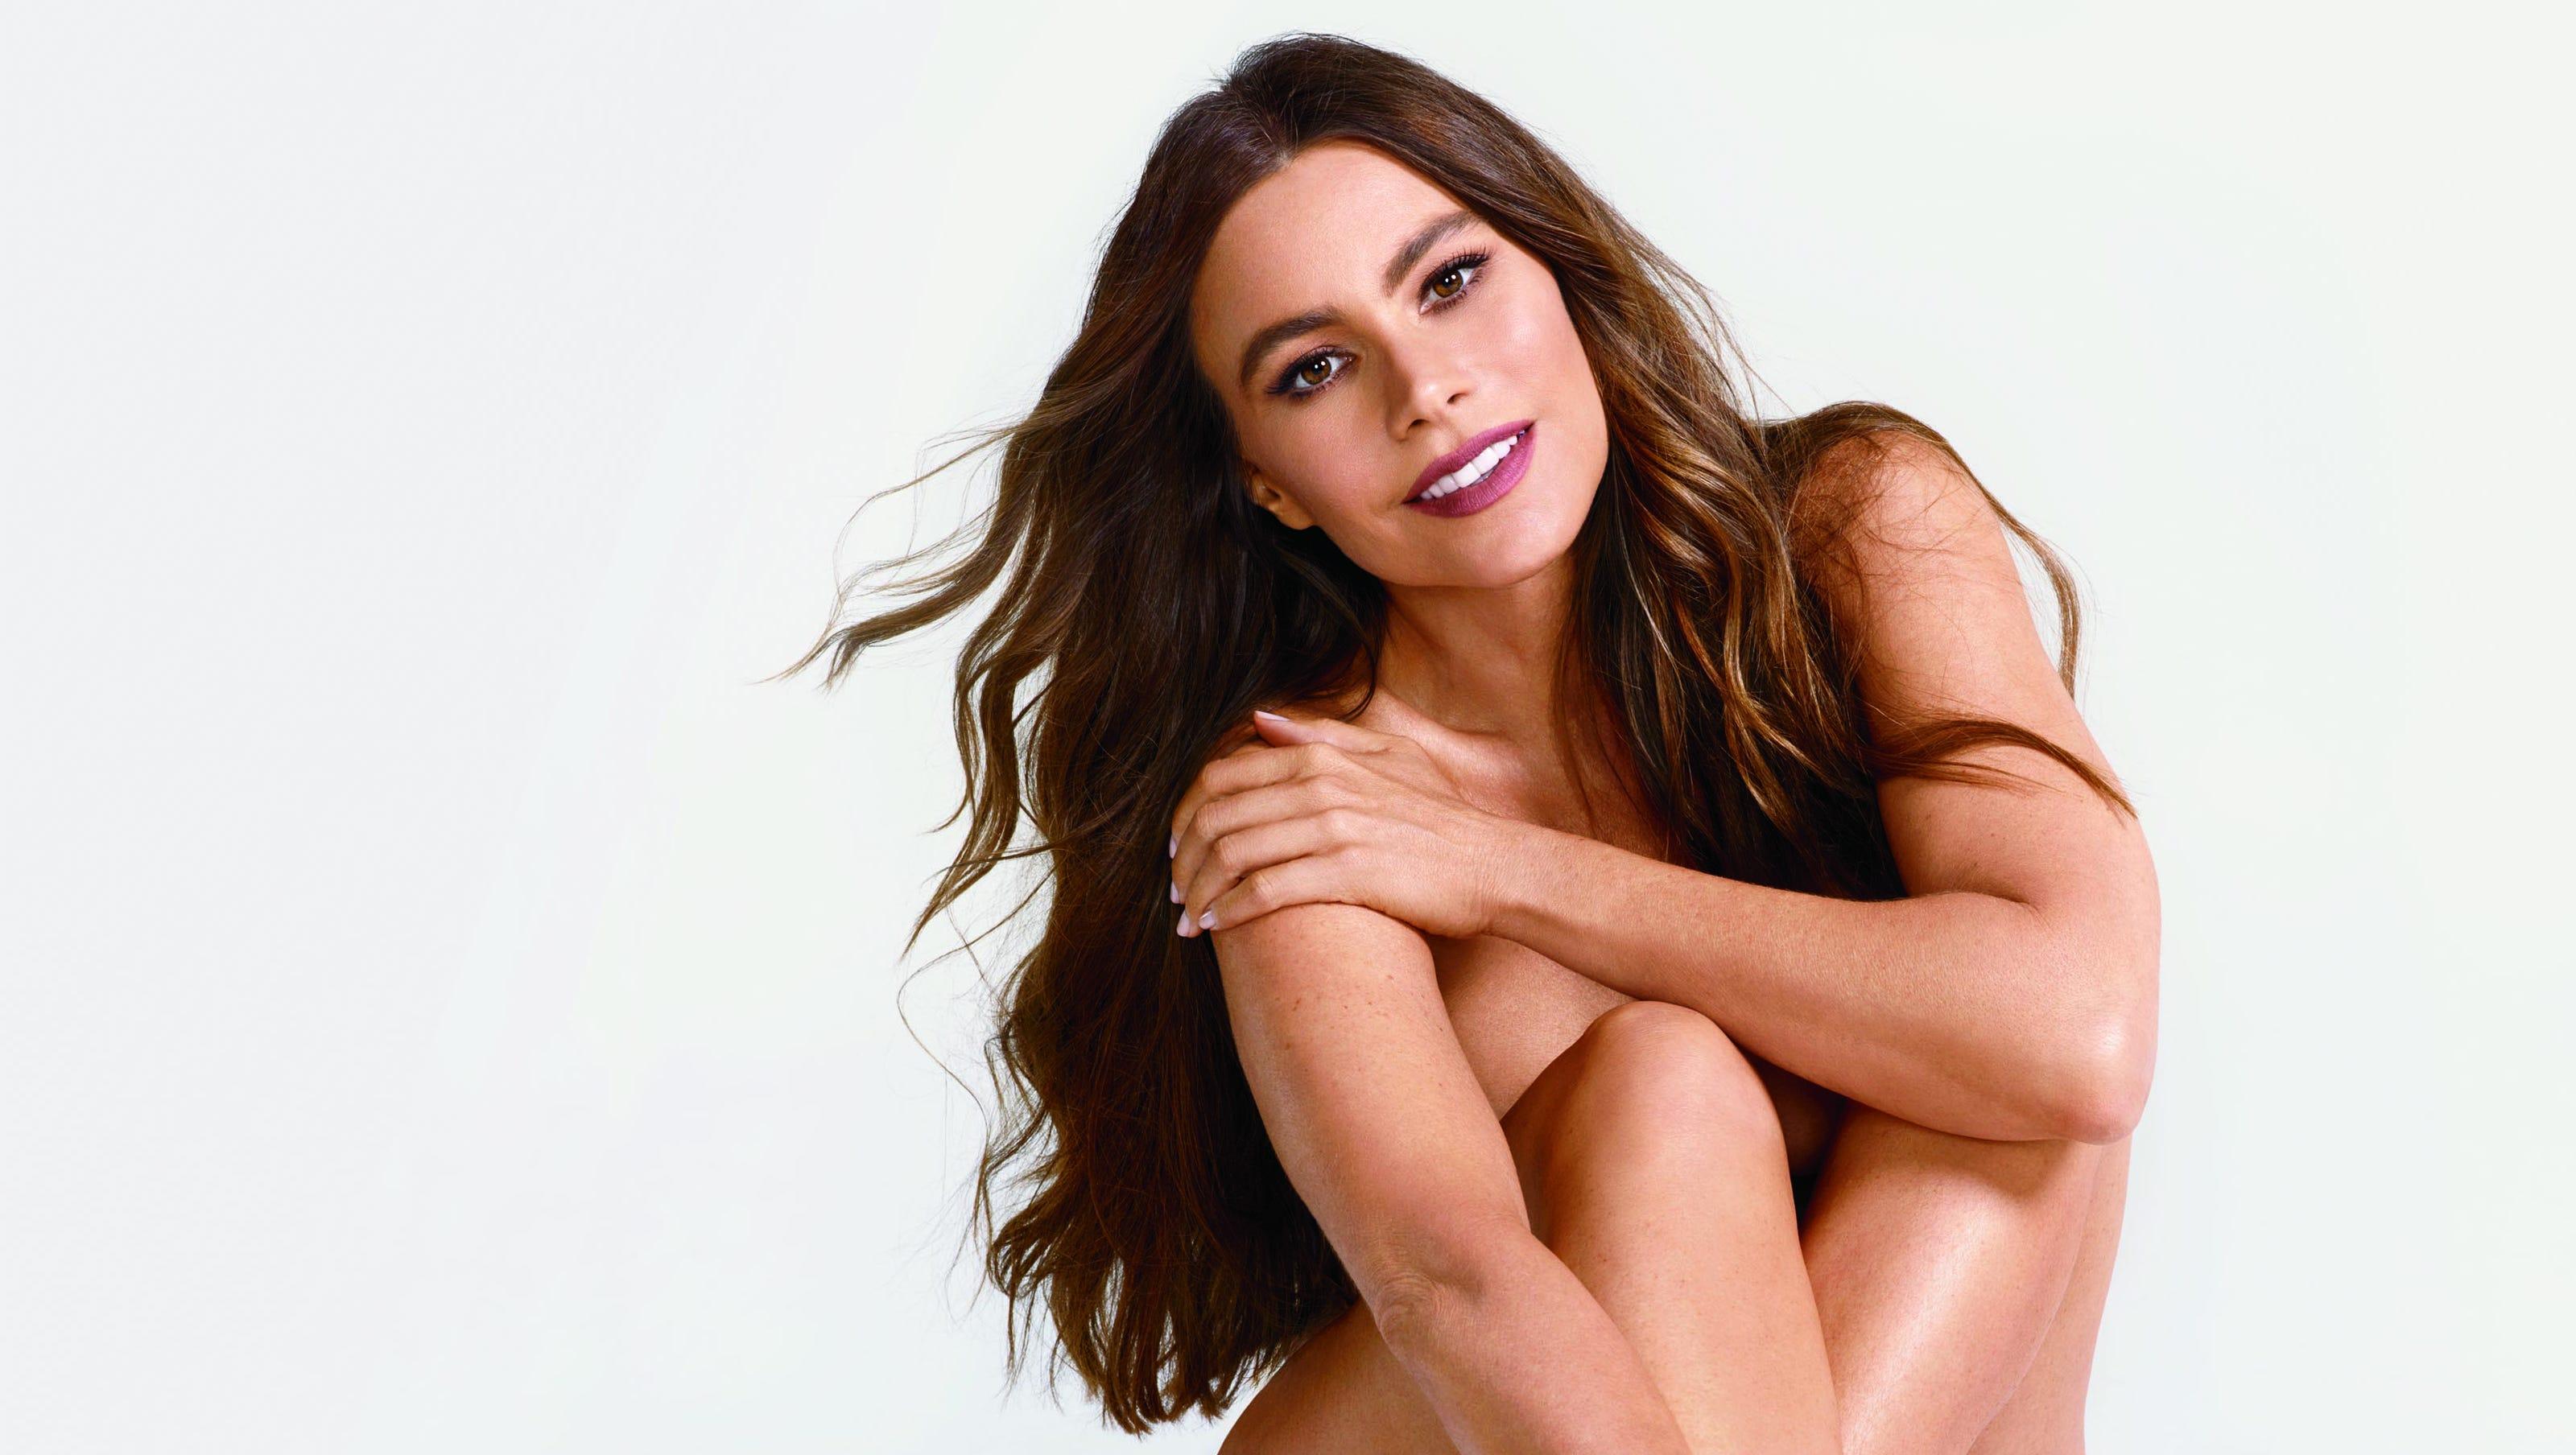 Amanda seyfried nude fakes